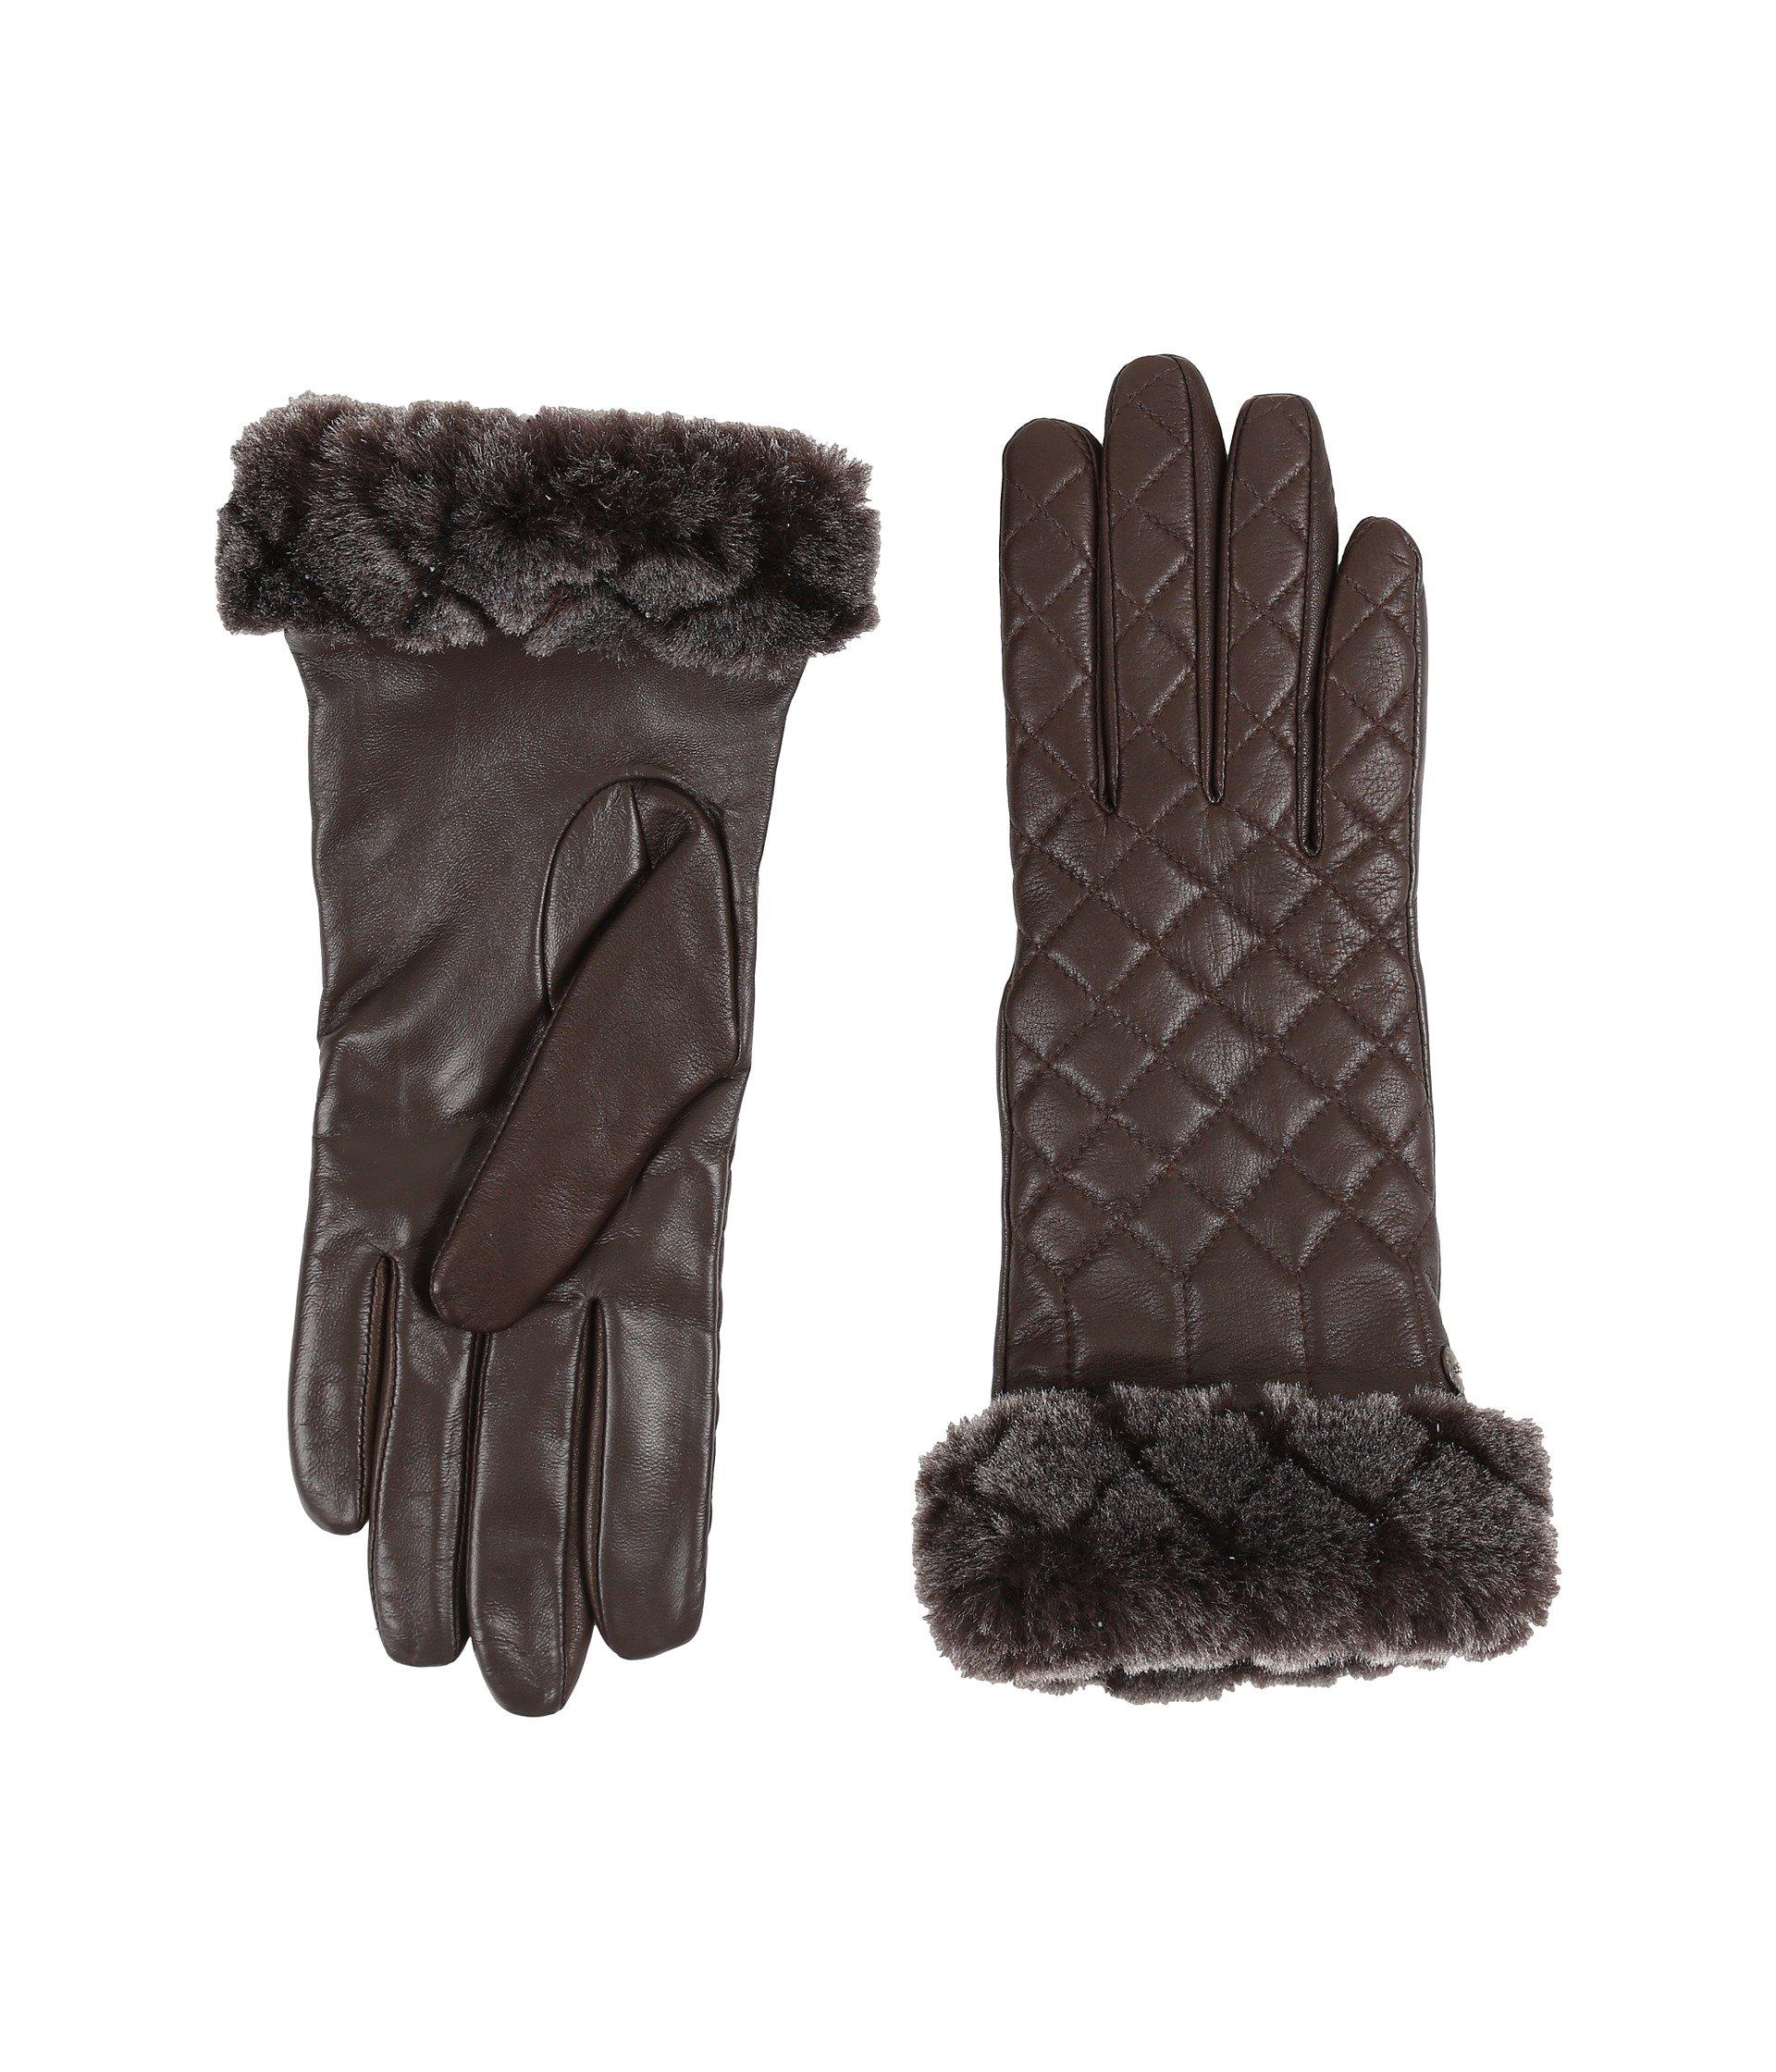 Guantes para Mujer UGG Quilted Croft Leather Smart Gloves  + UGG en VeoyCompro.net